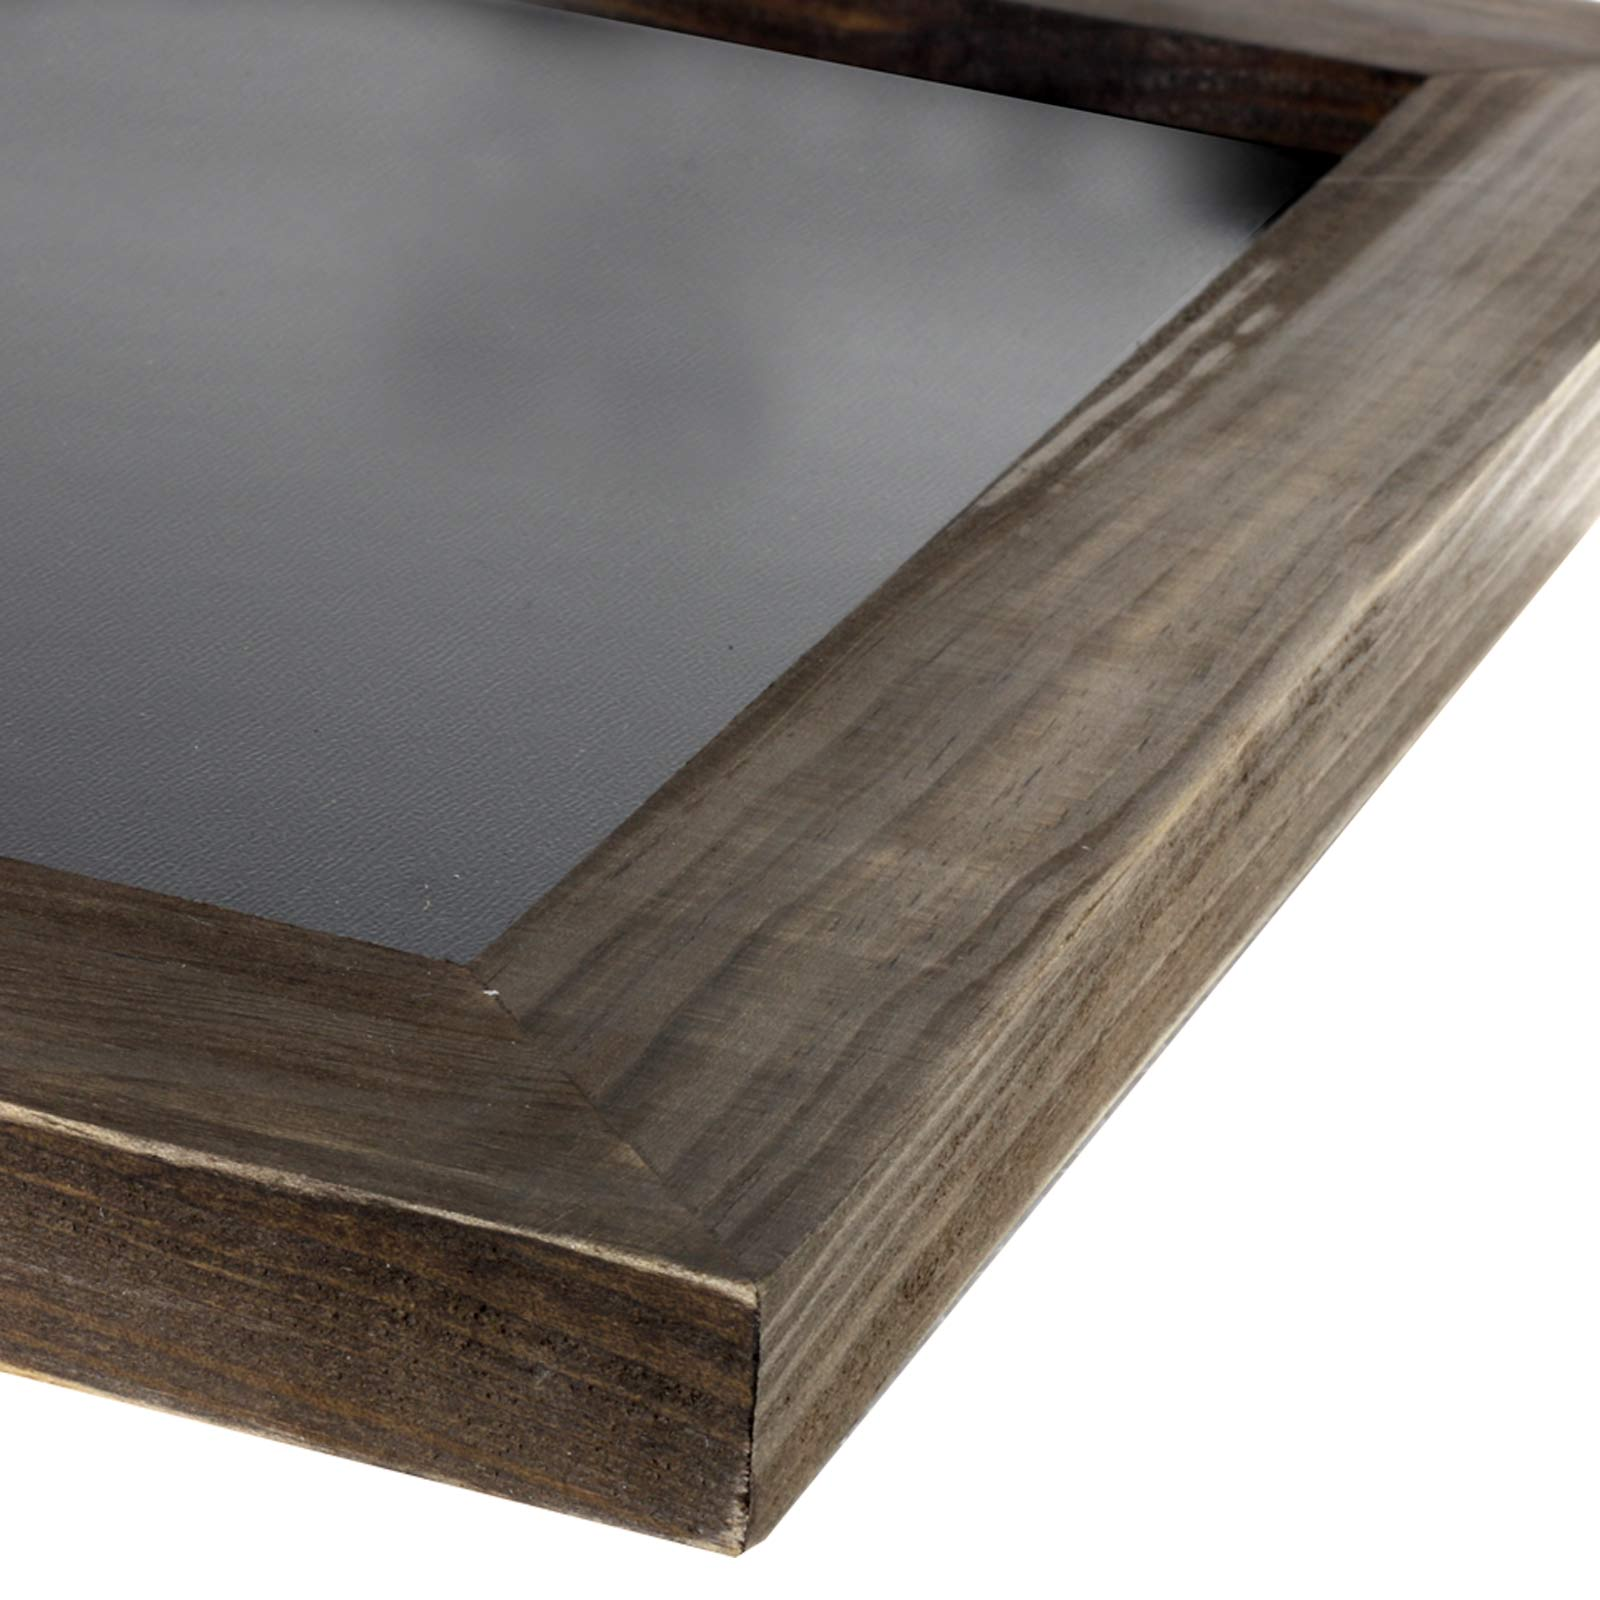 kreidetafel medan mit kordel 40x30cm beschreibbar tafel wandtafel holz vintage ebay. Black Bedroom Furniture Sets. Home Design Ideas